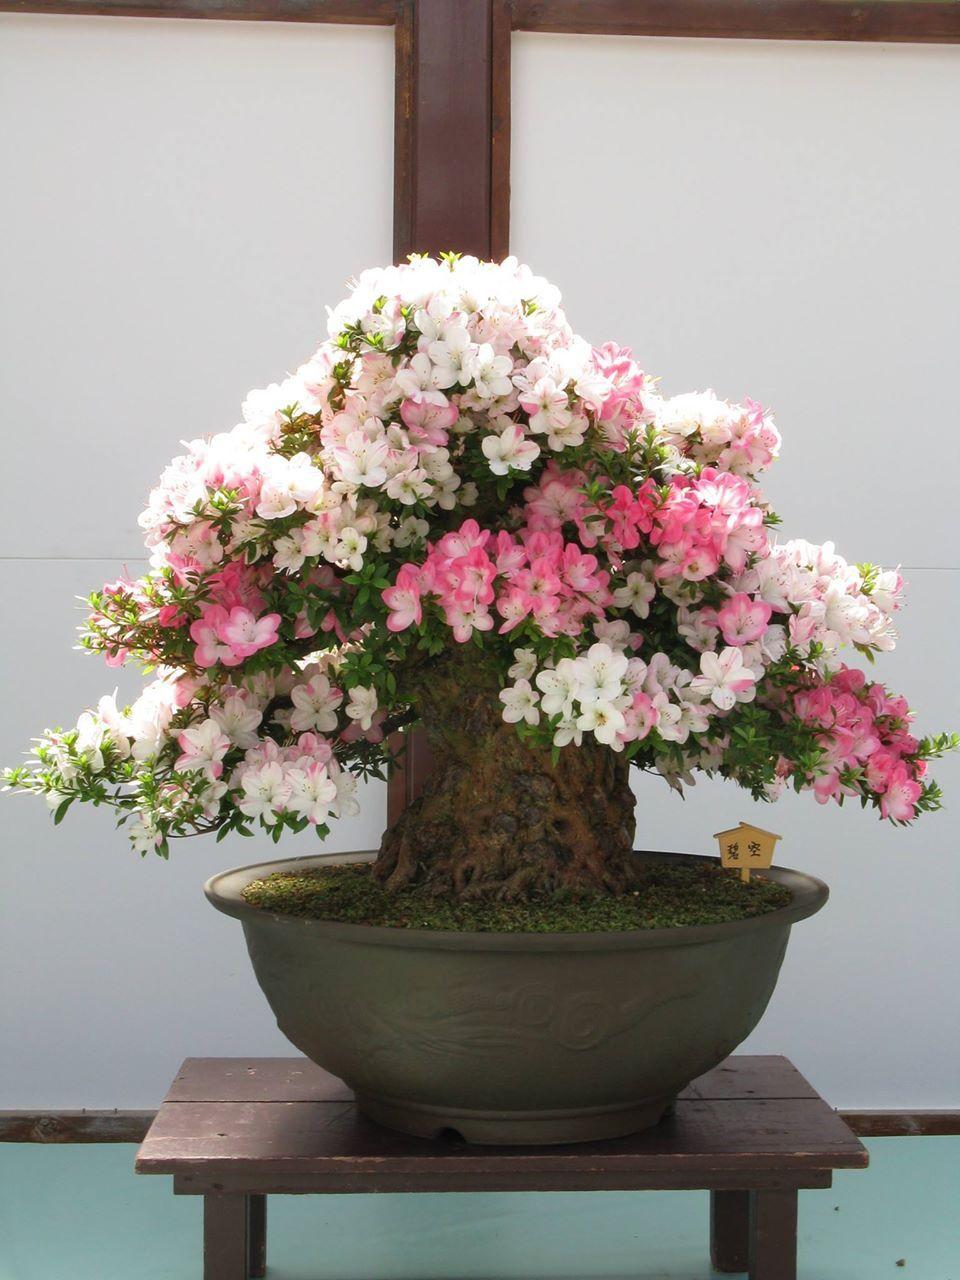 Bonsai Tree With Pink White Flowers Plants Bonsai Trees